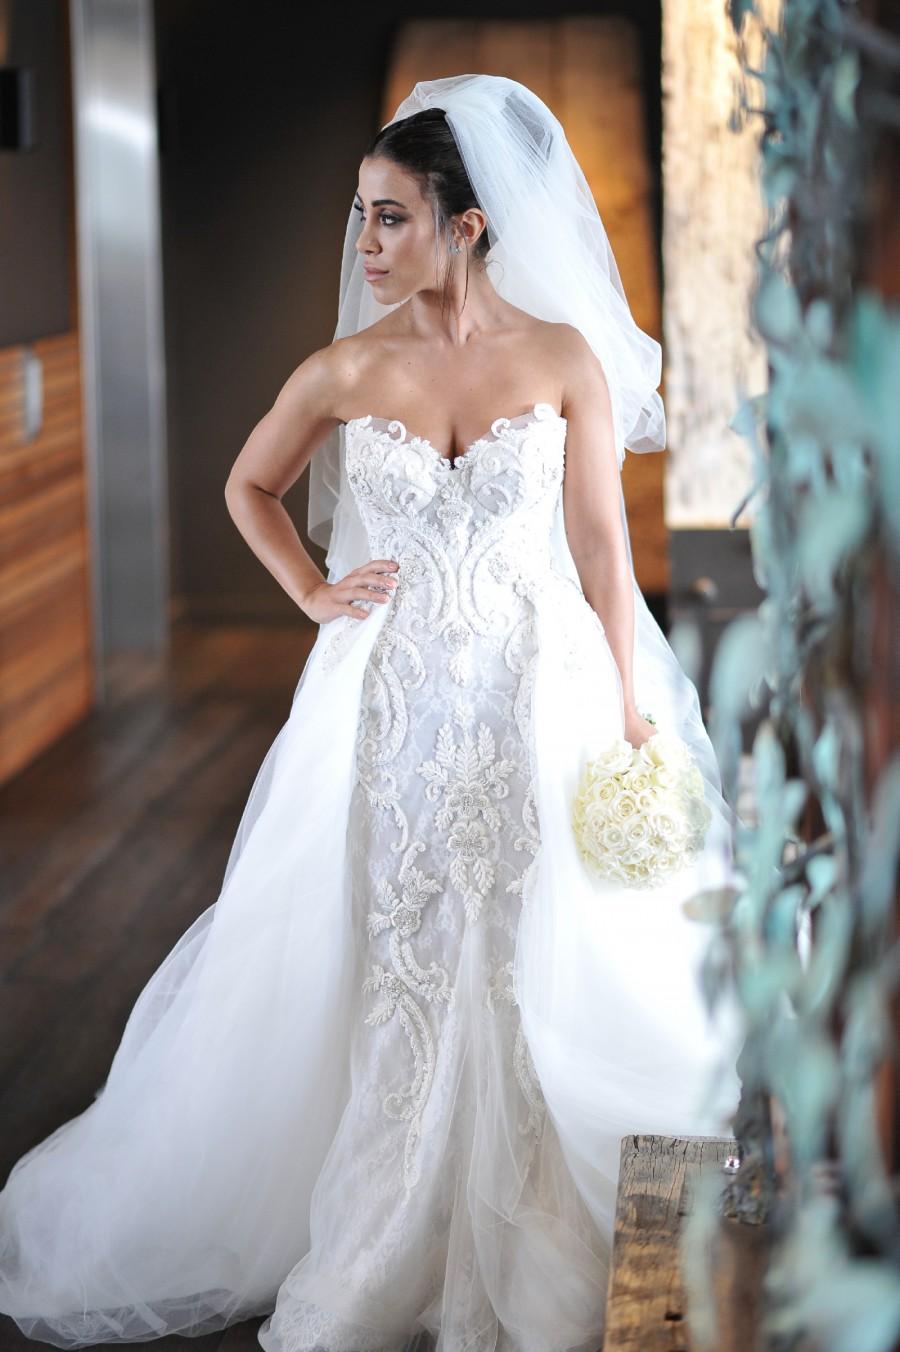 Most Popular Wedding Dresses of 2016